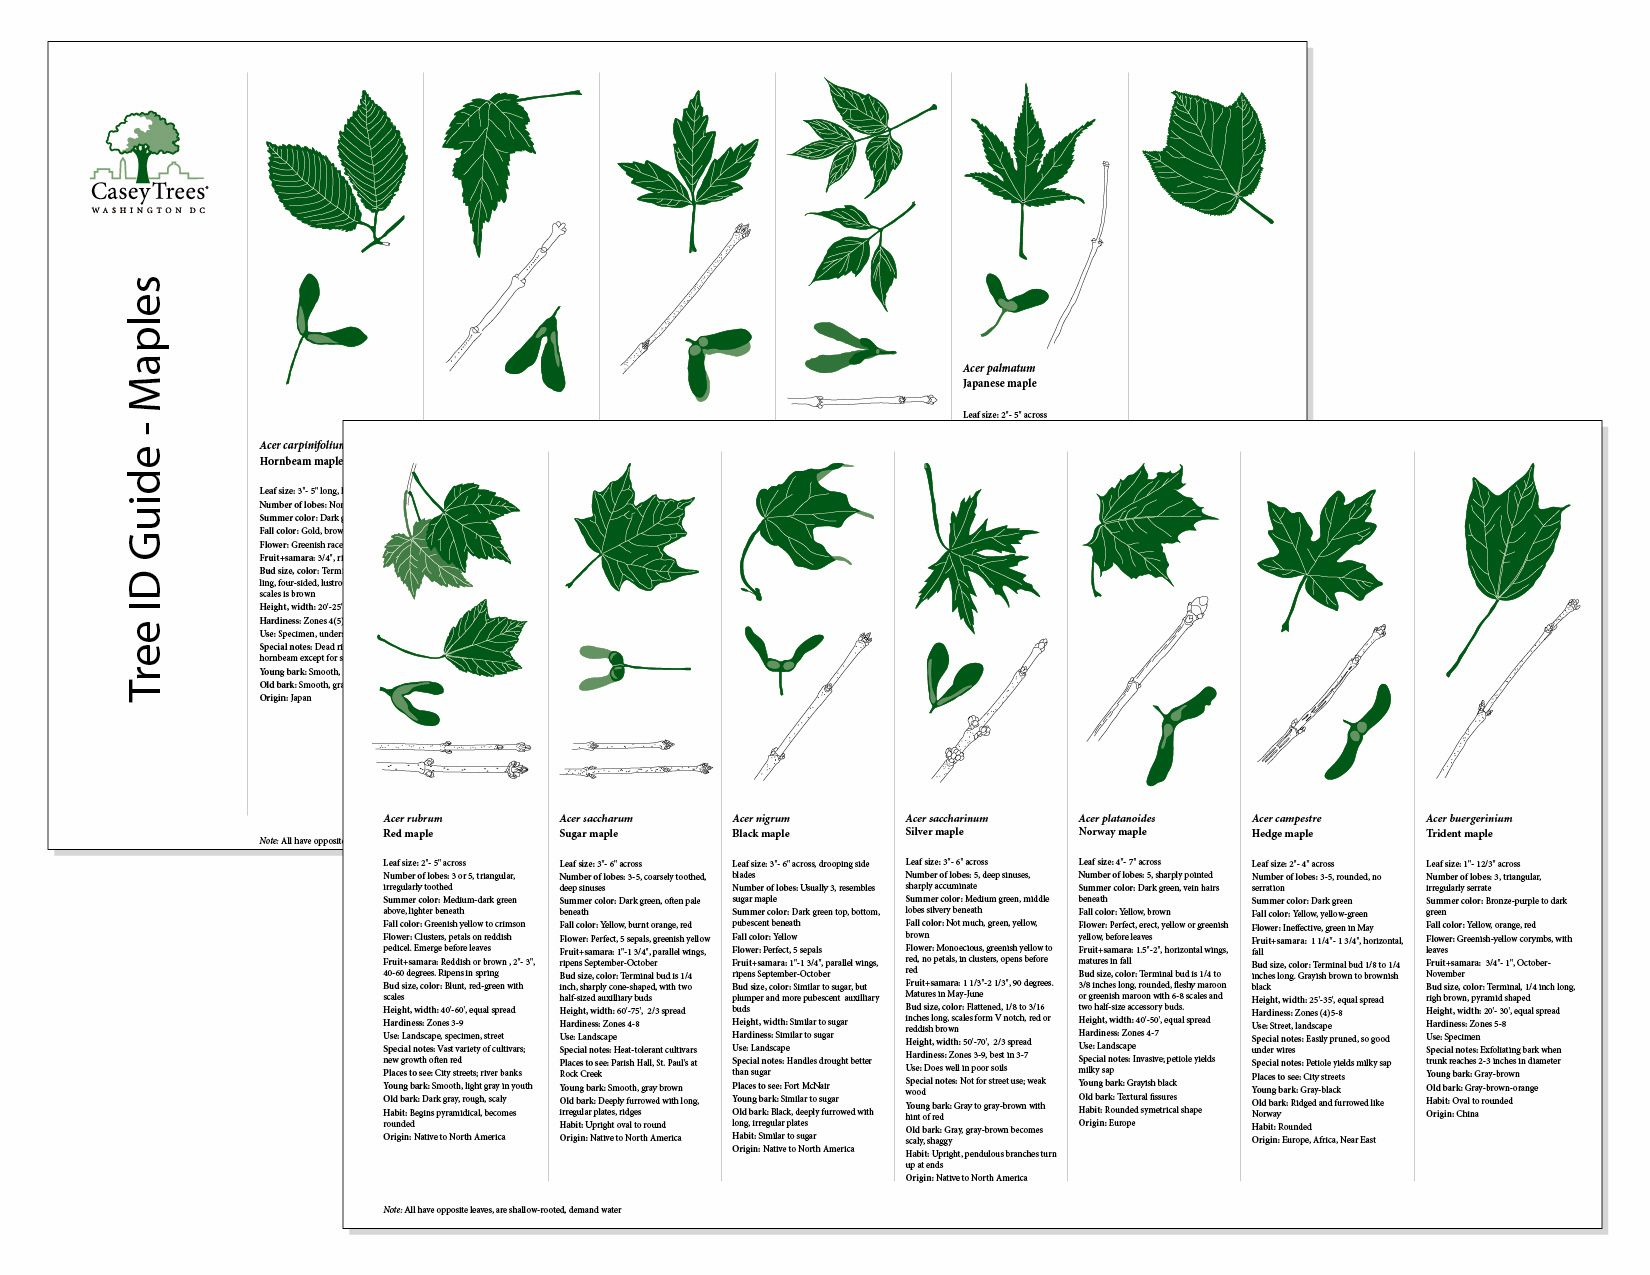 Tree Bark Identification Chart Google Search Silver Maple Tree Tree Leaf Identification Tree Bark Identification